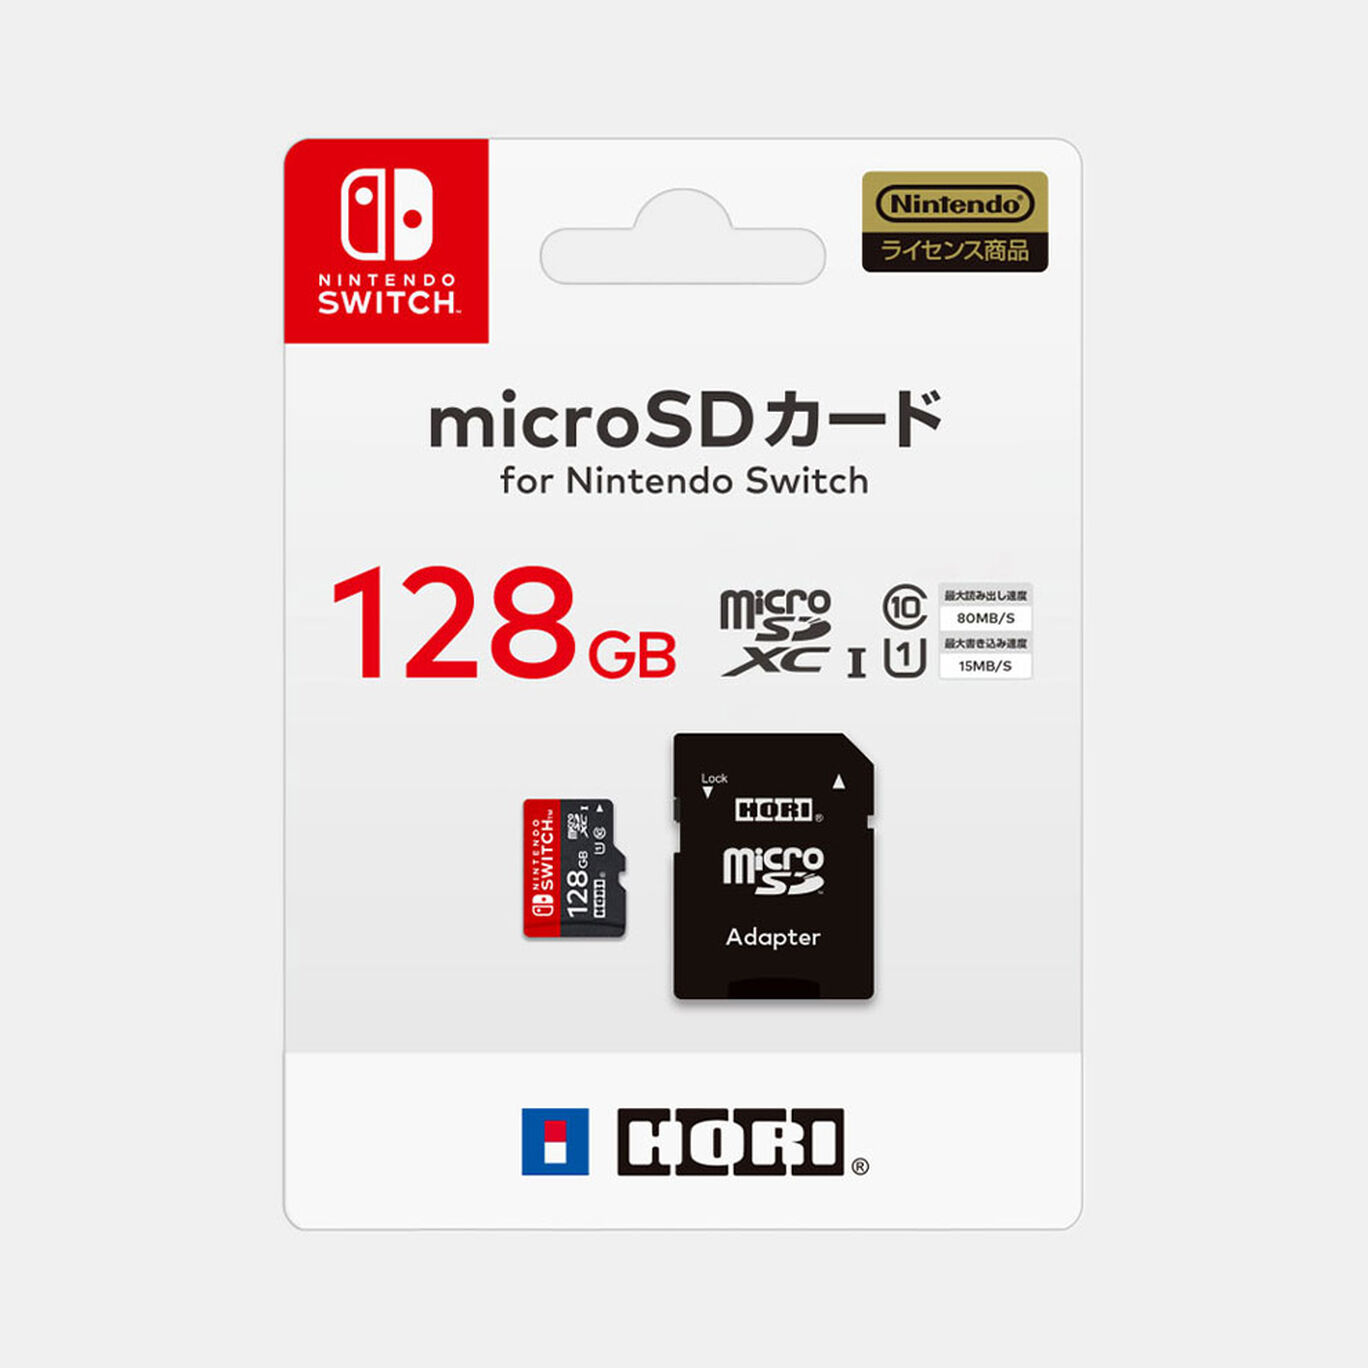 HORI microSDカード for Nintendo Switch 128GB